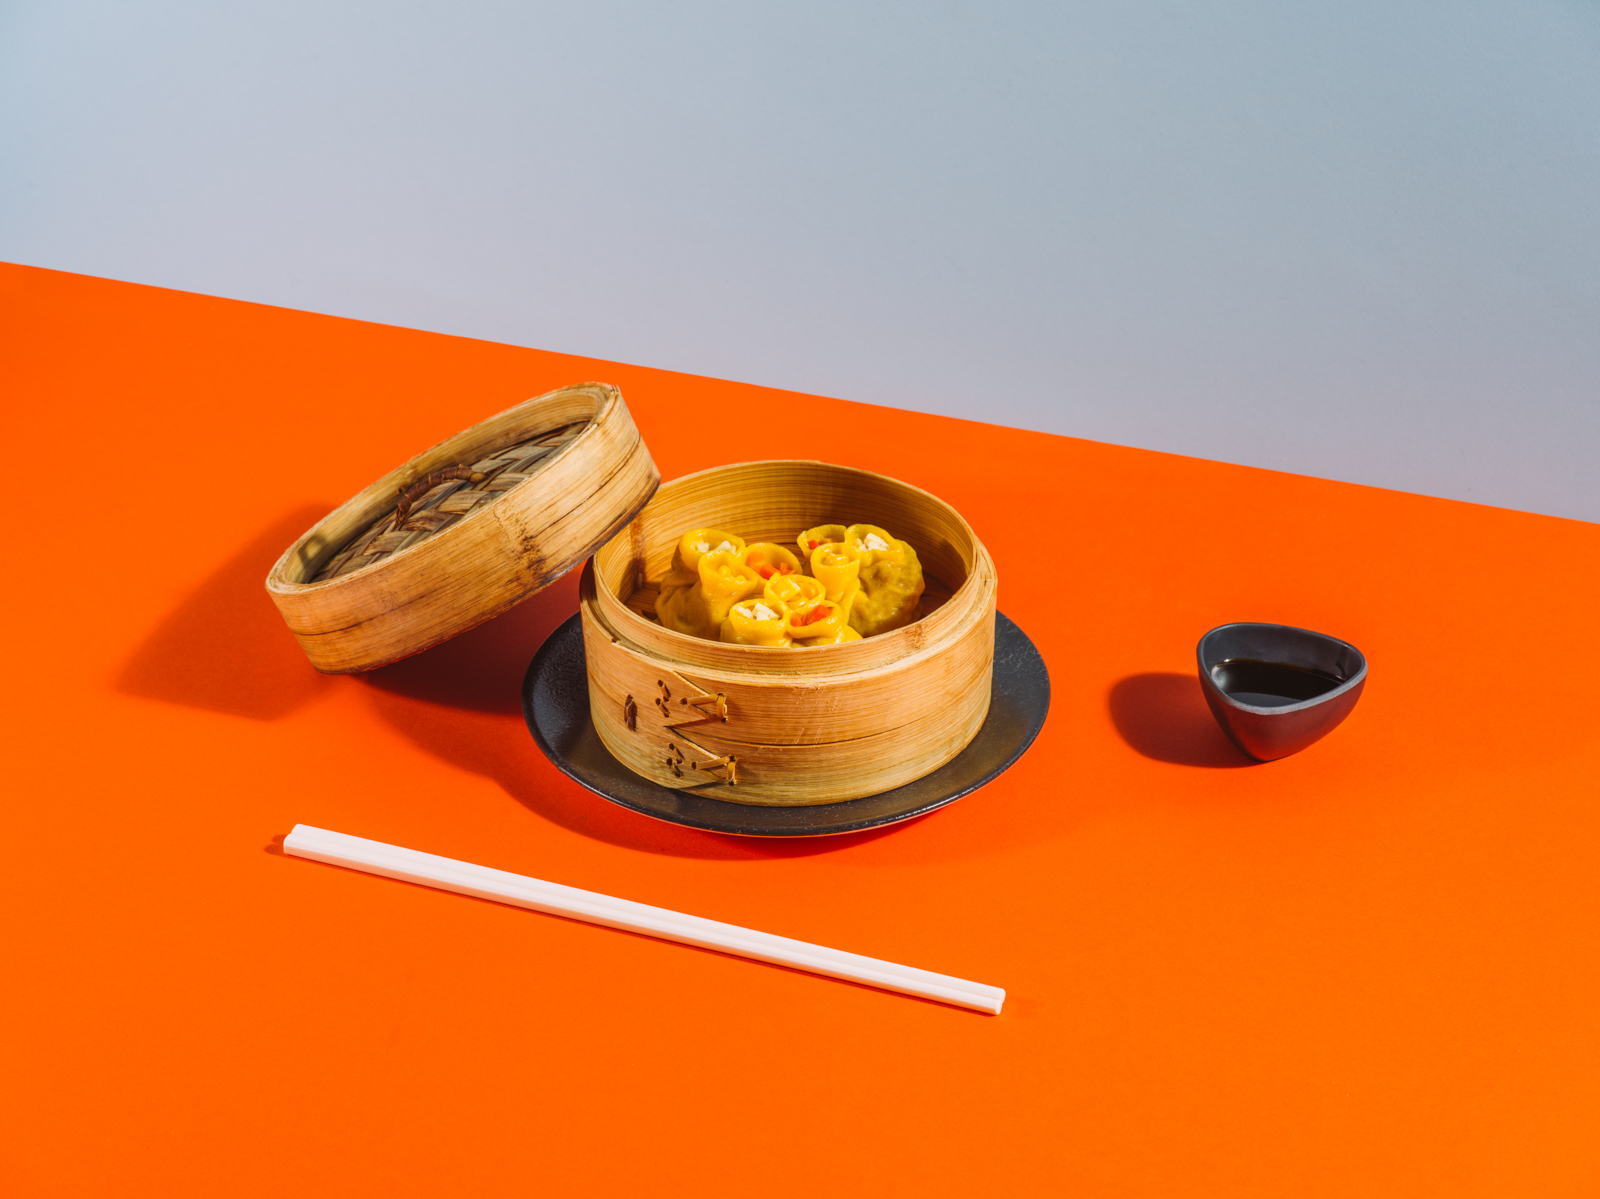 Rice-and-Gold-Food-All-Good-NYC-Nick-Johnson-Photography-30.JPG